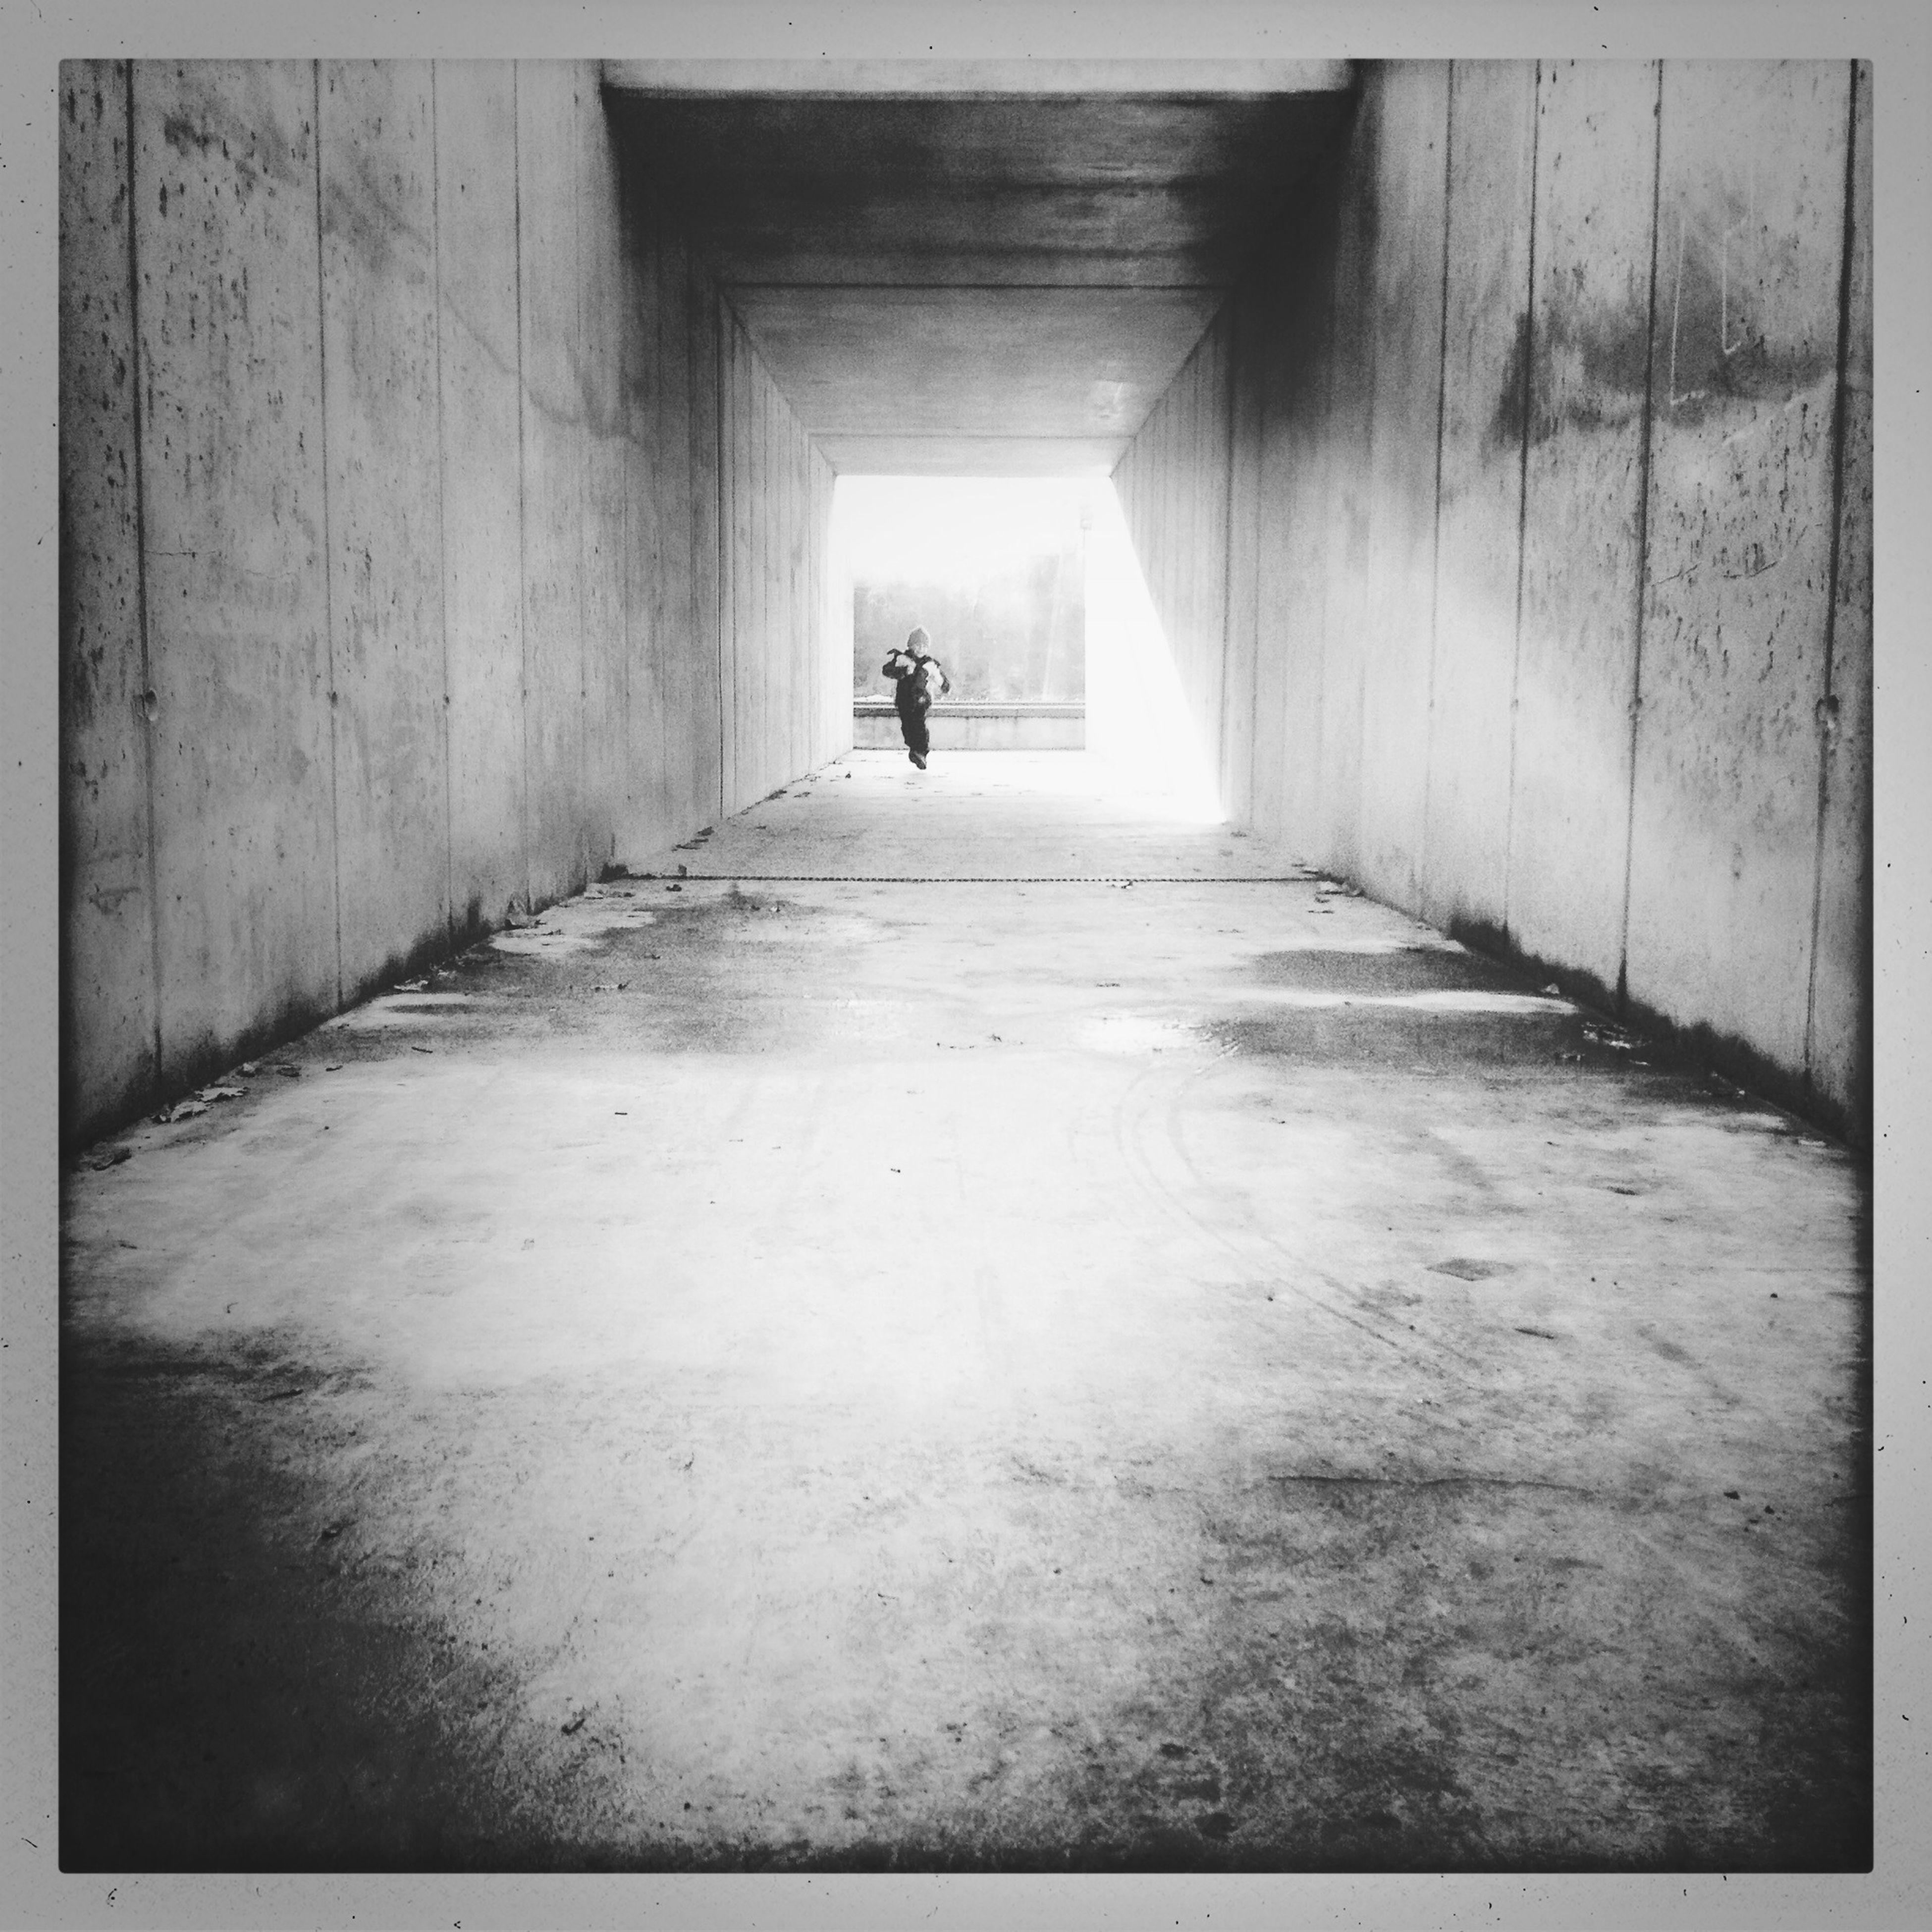 Running through the tunnel